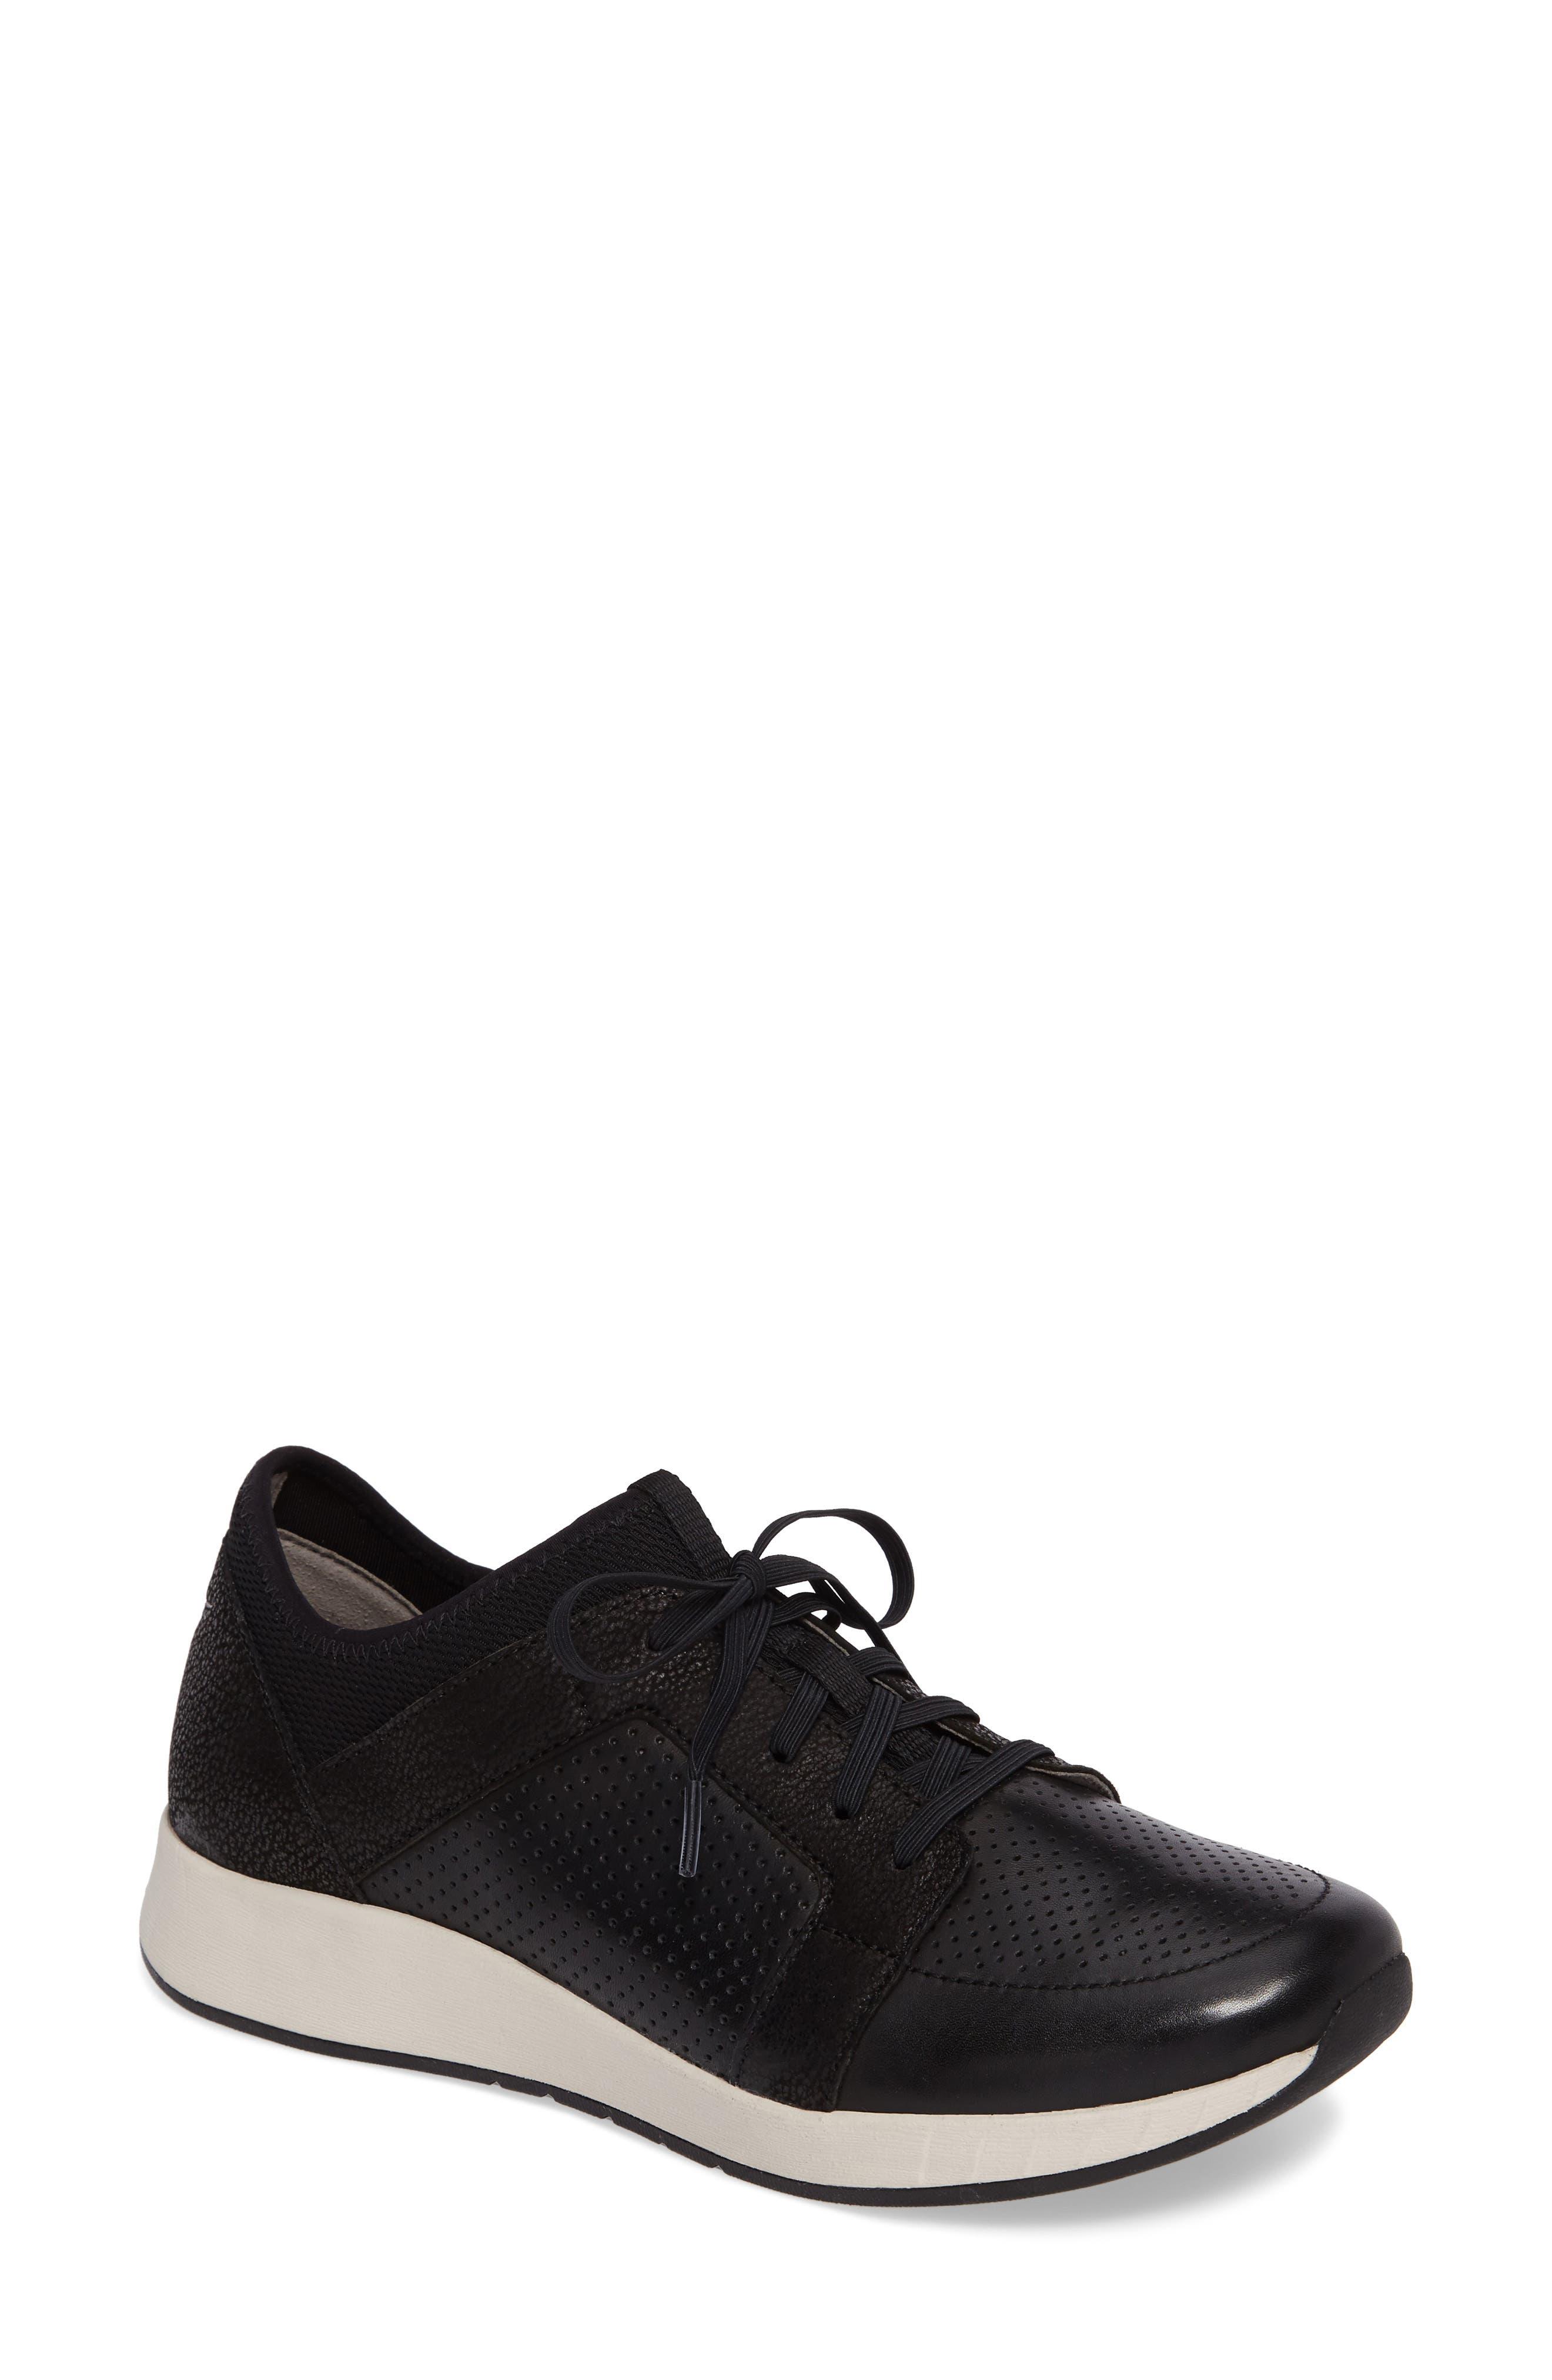 Cozette Slip-On Sneaker,                             Main thumbnail 1, color,                             001